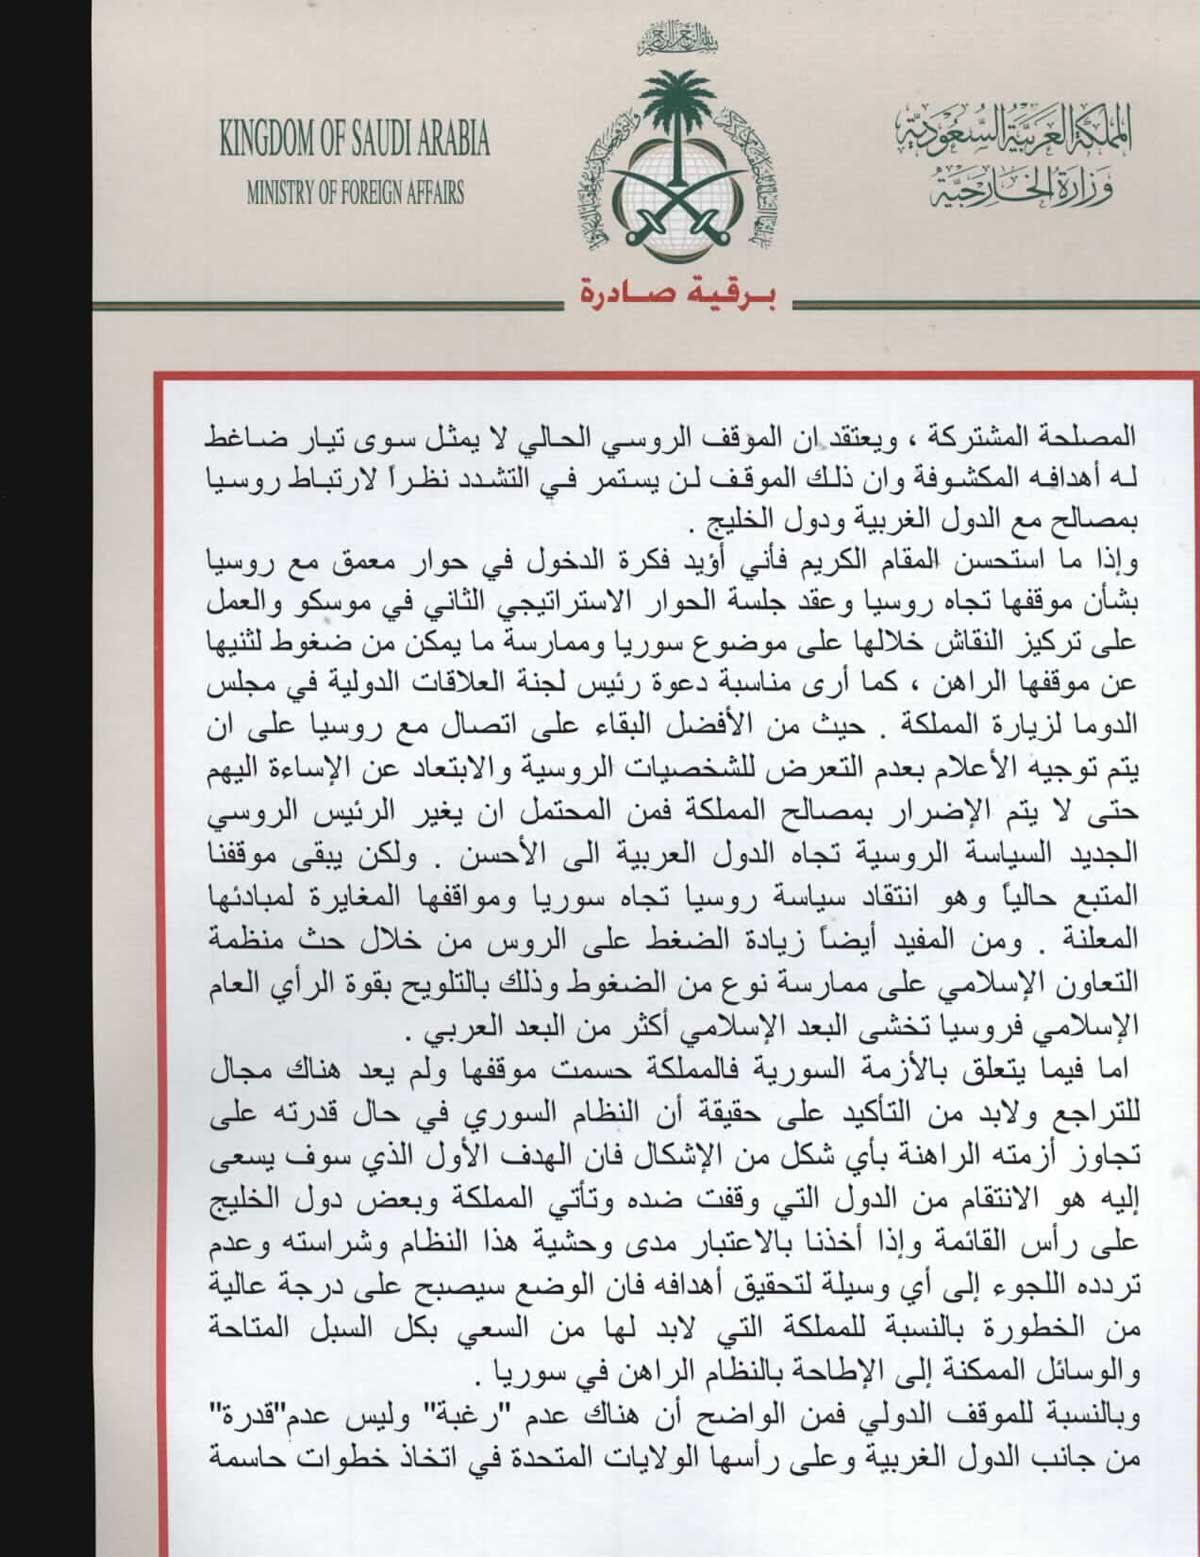 SaudiLeaks - Syrian regime change